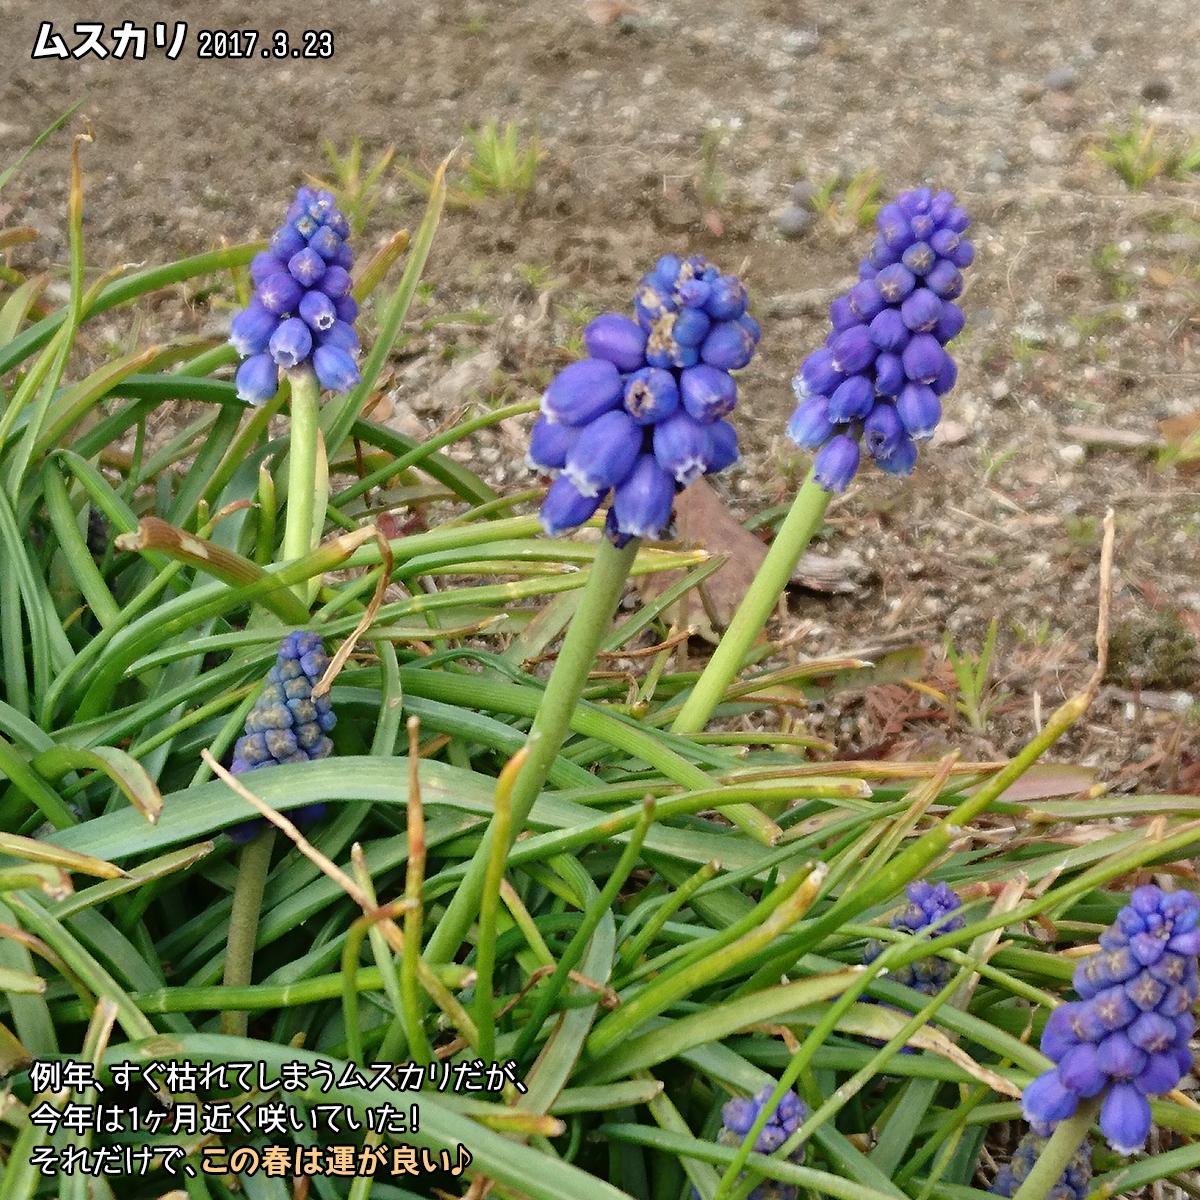 DSC_2080_20170420160342508.jpg